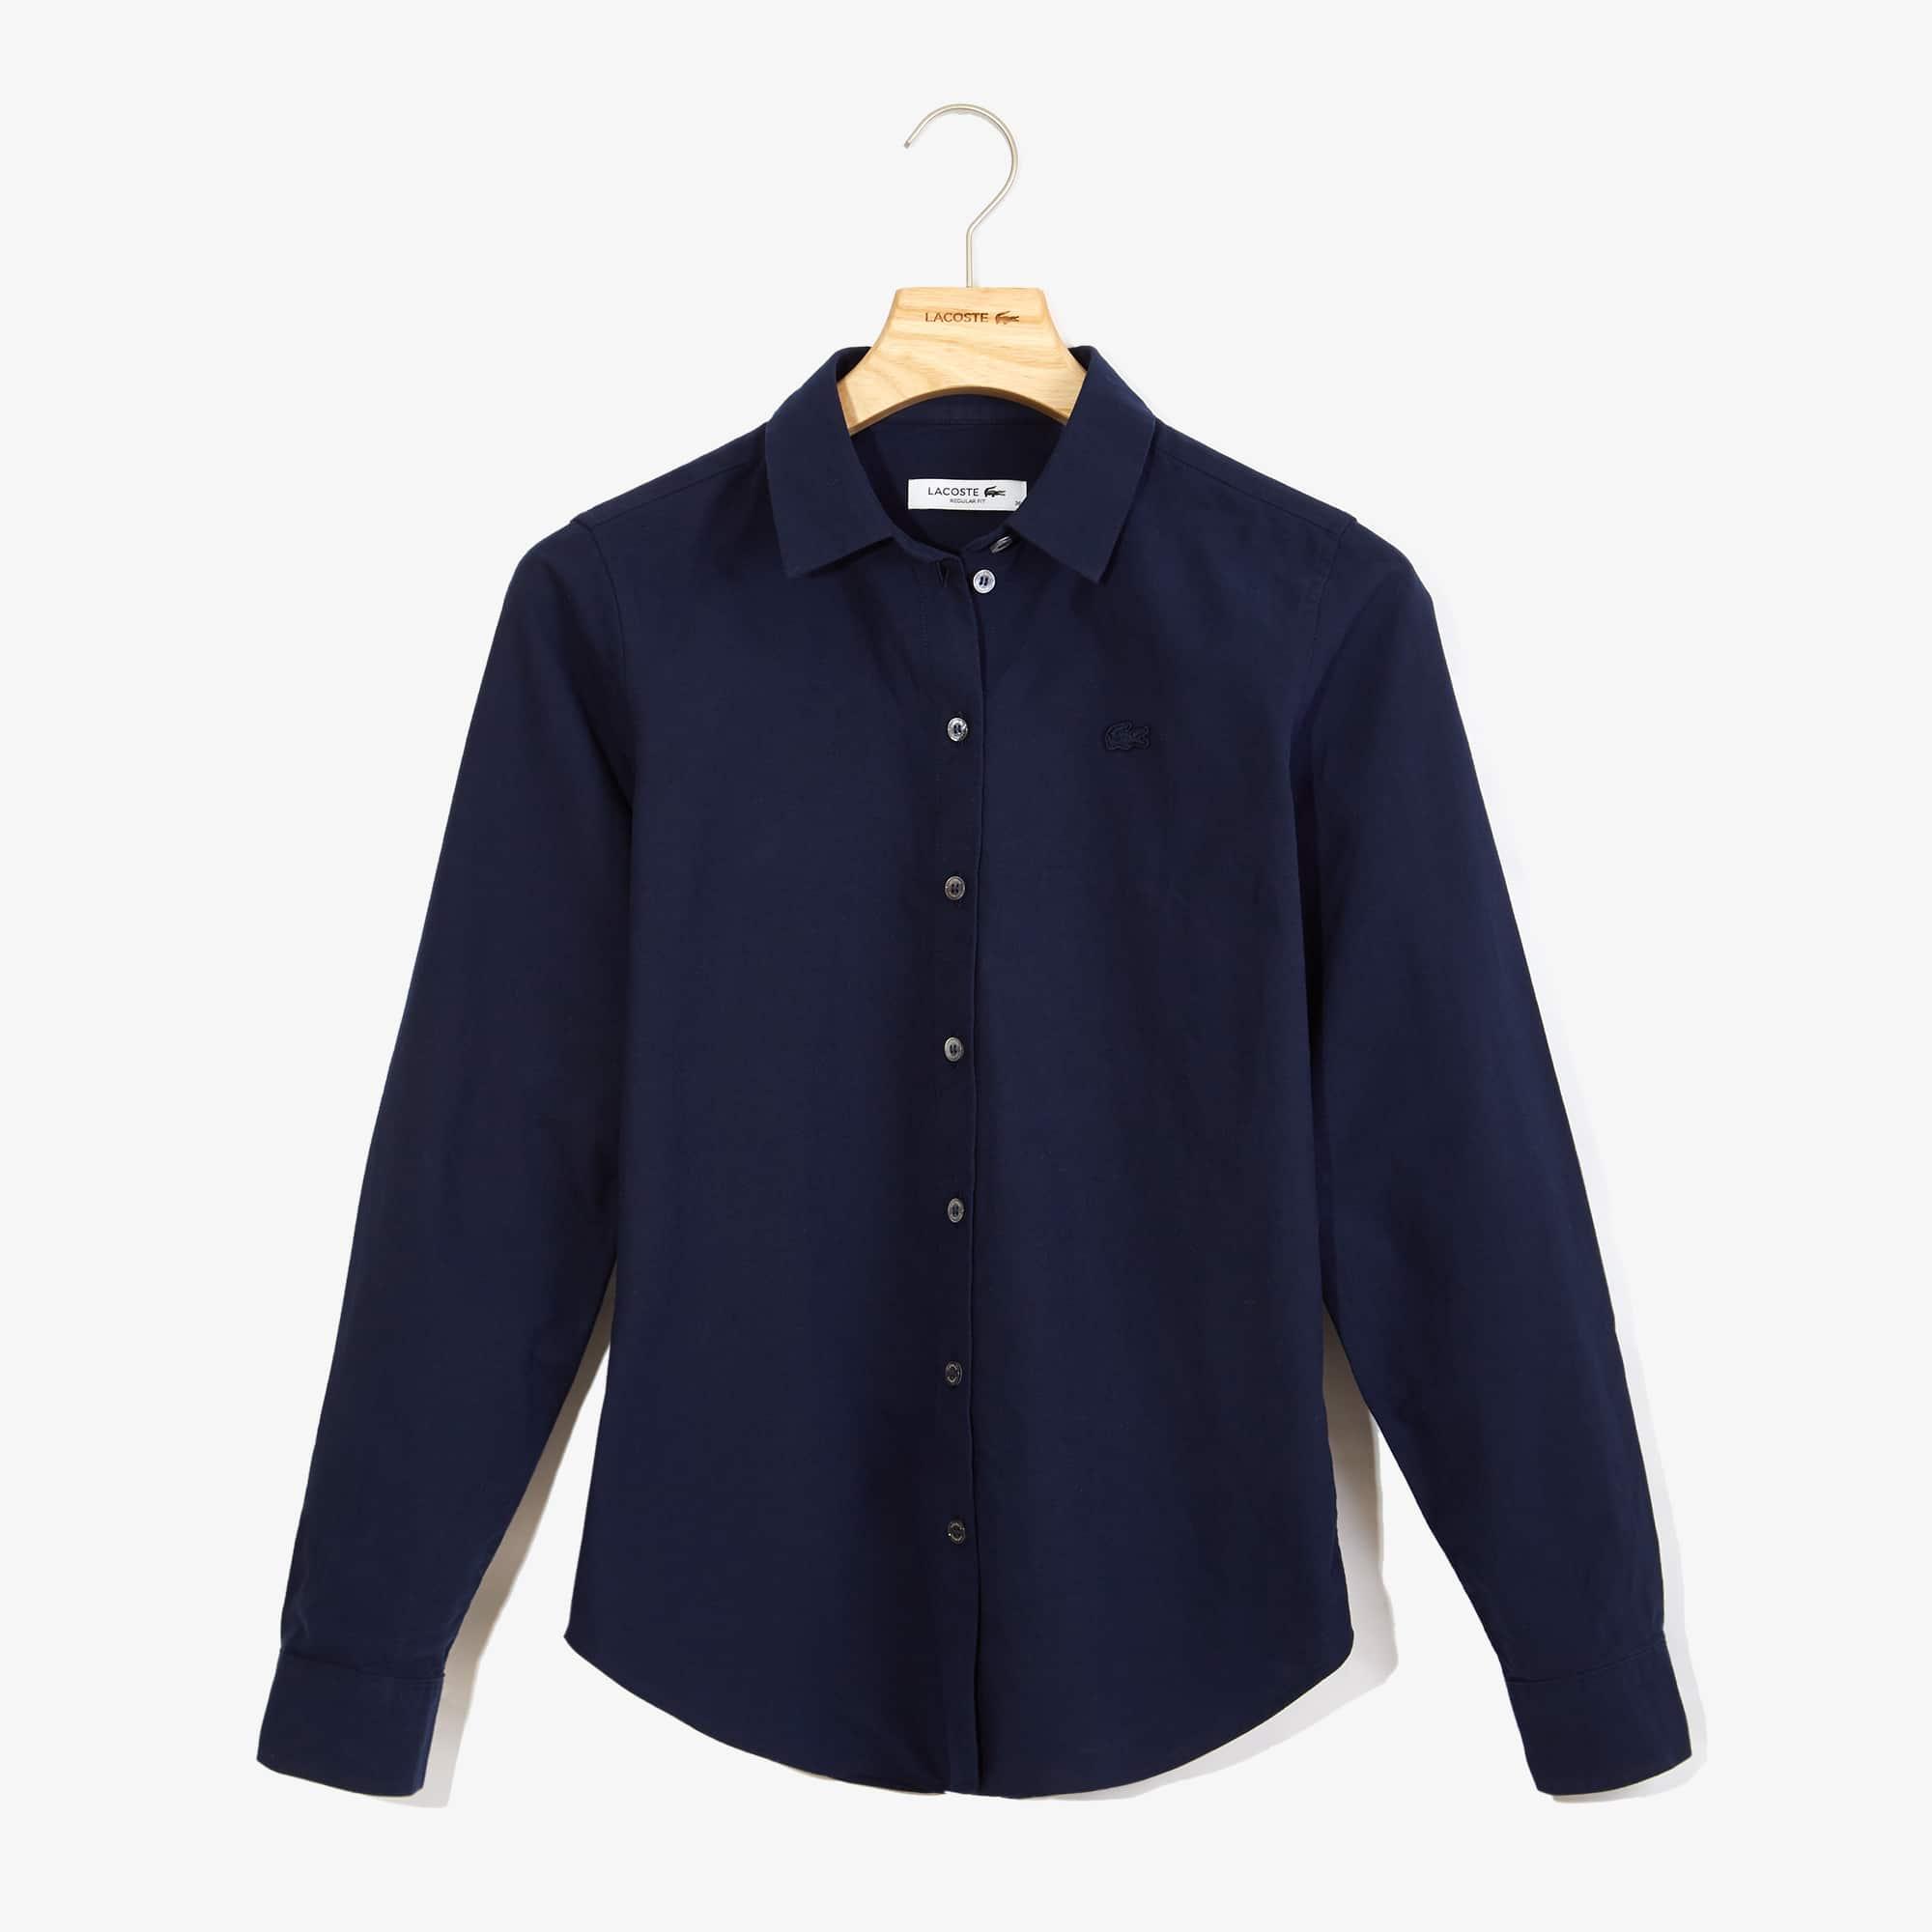 Lacoste Tops Women's Regular Fit Oxford Cotton Shirt